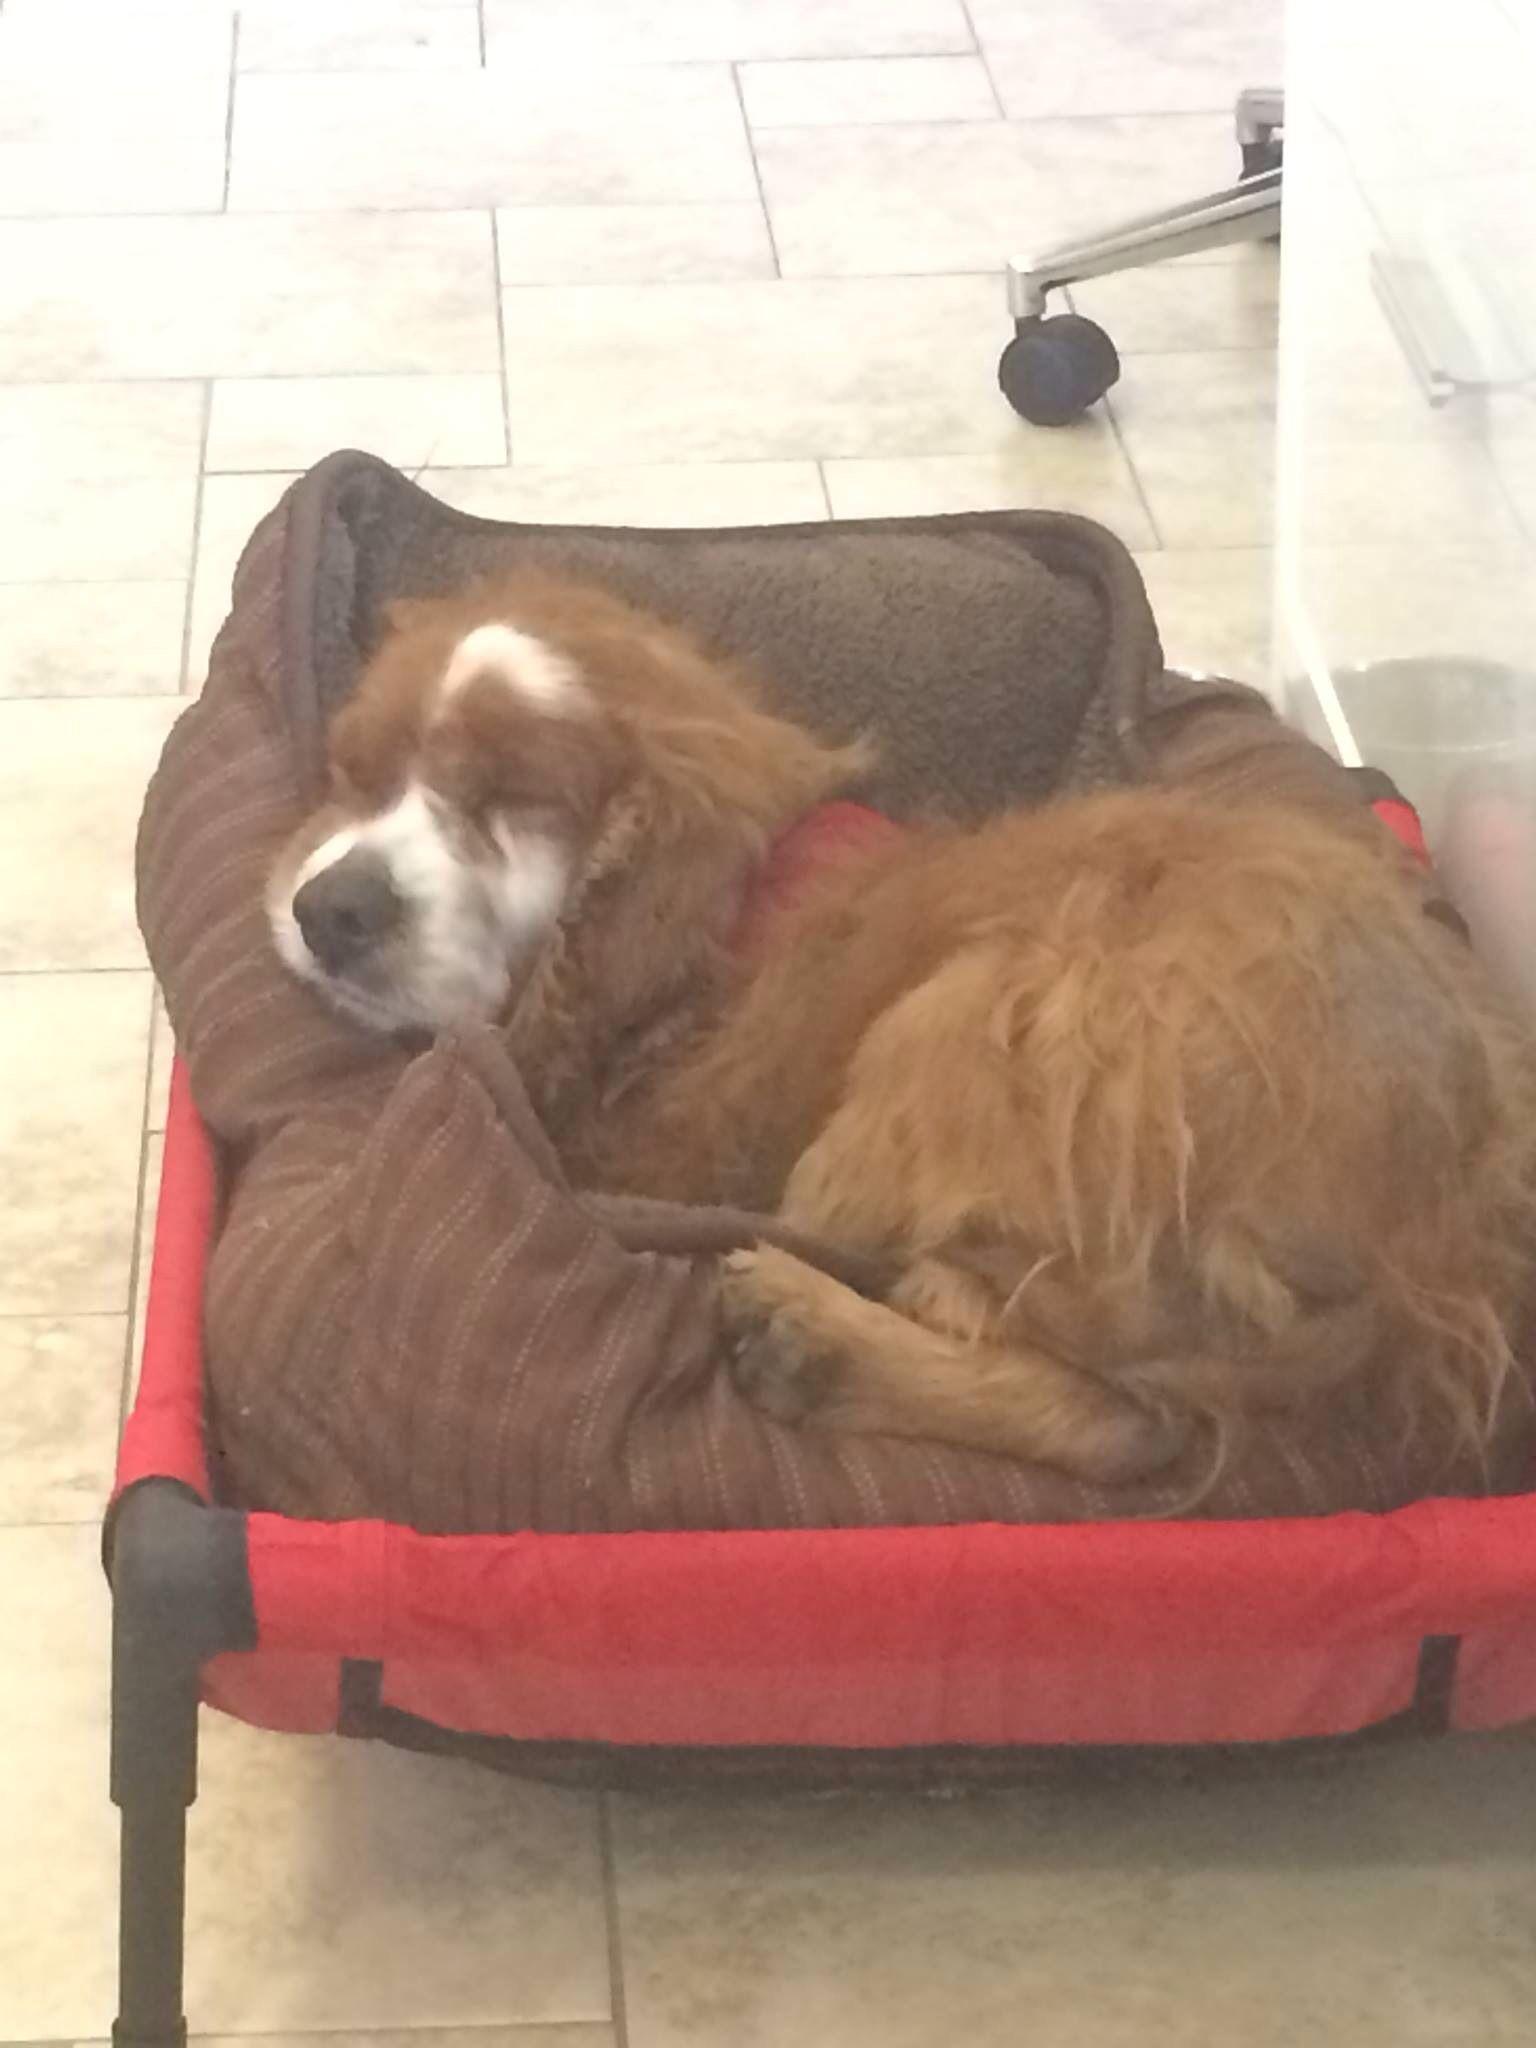 Lostdog 8 1 14 Nelson Seattle Wa Cockerspaniel Senior Male Requires Medication Collar Microchip 206 557 4661 Http Losing A Dog Cocker Spaniel Find Pets